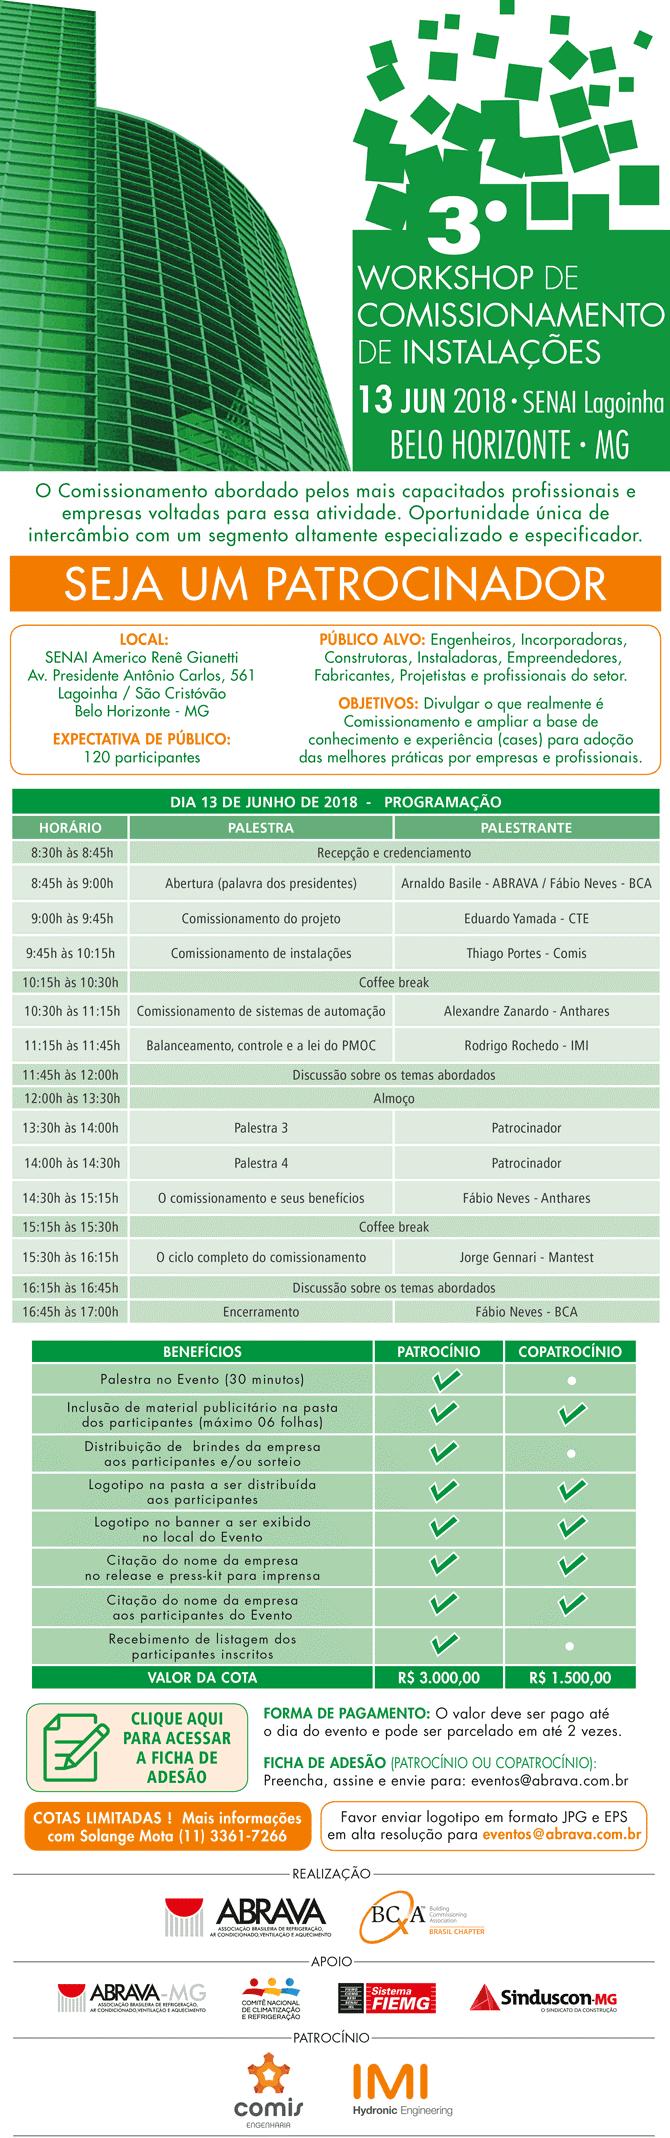 Evento-BCA-MG-patrocinio-v2-10-de-maio-1